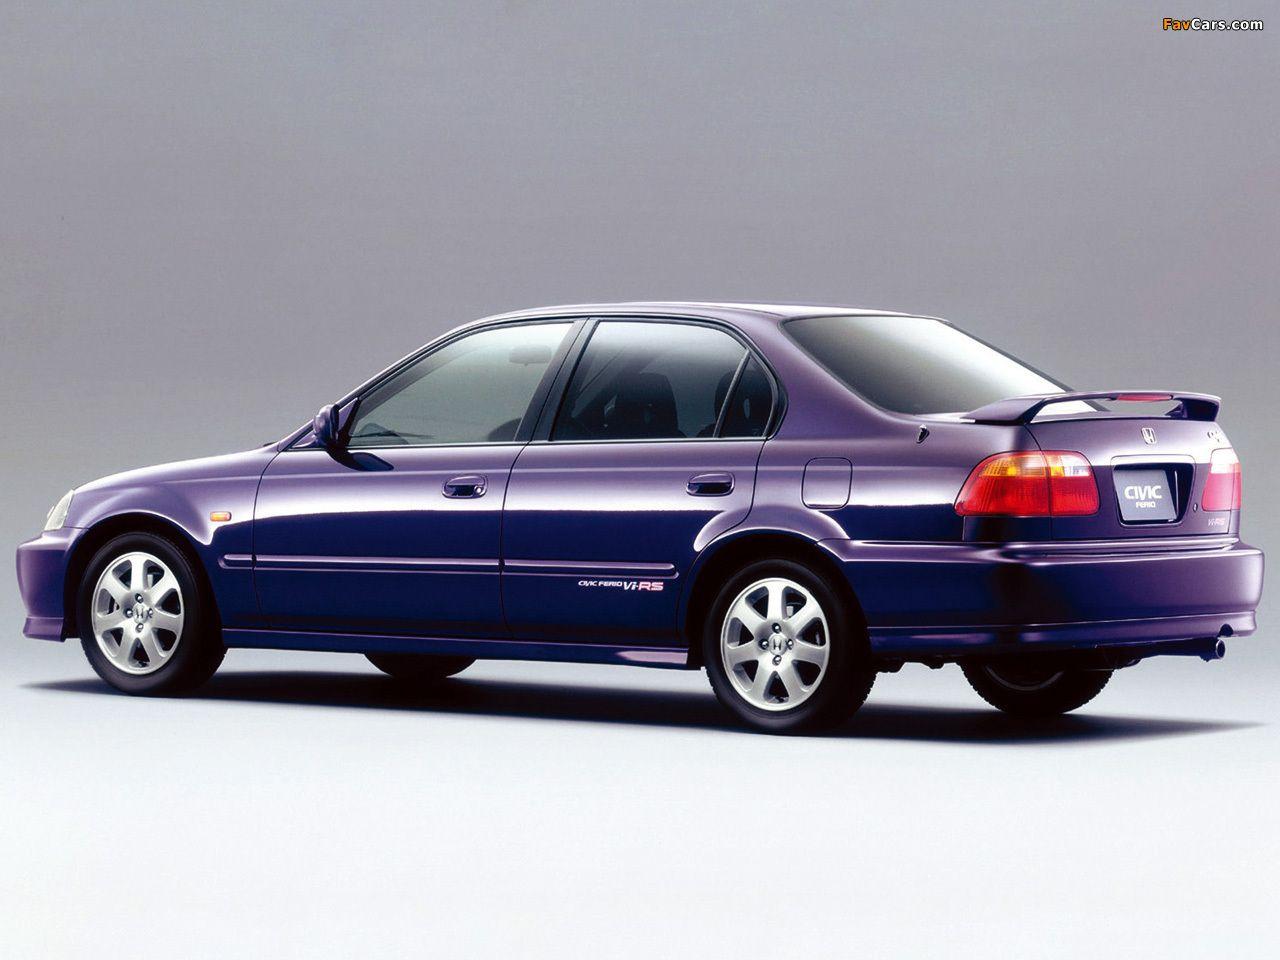 Honda Civic Ferio: specifications and description of models of three generations of Japanese sedan